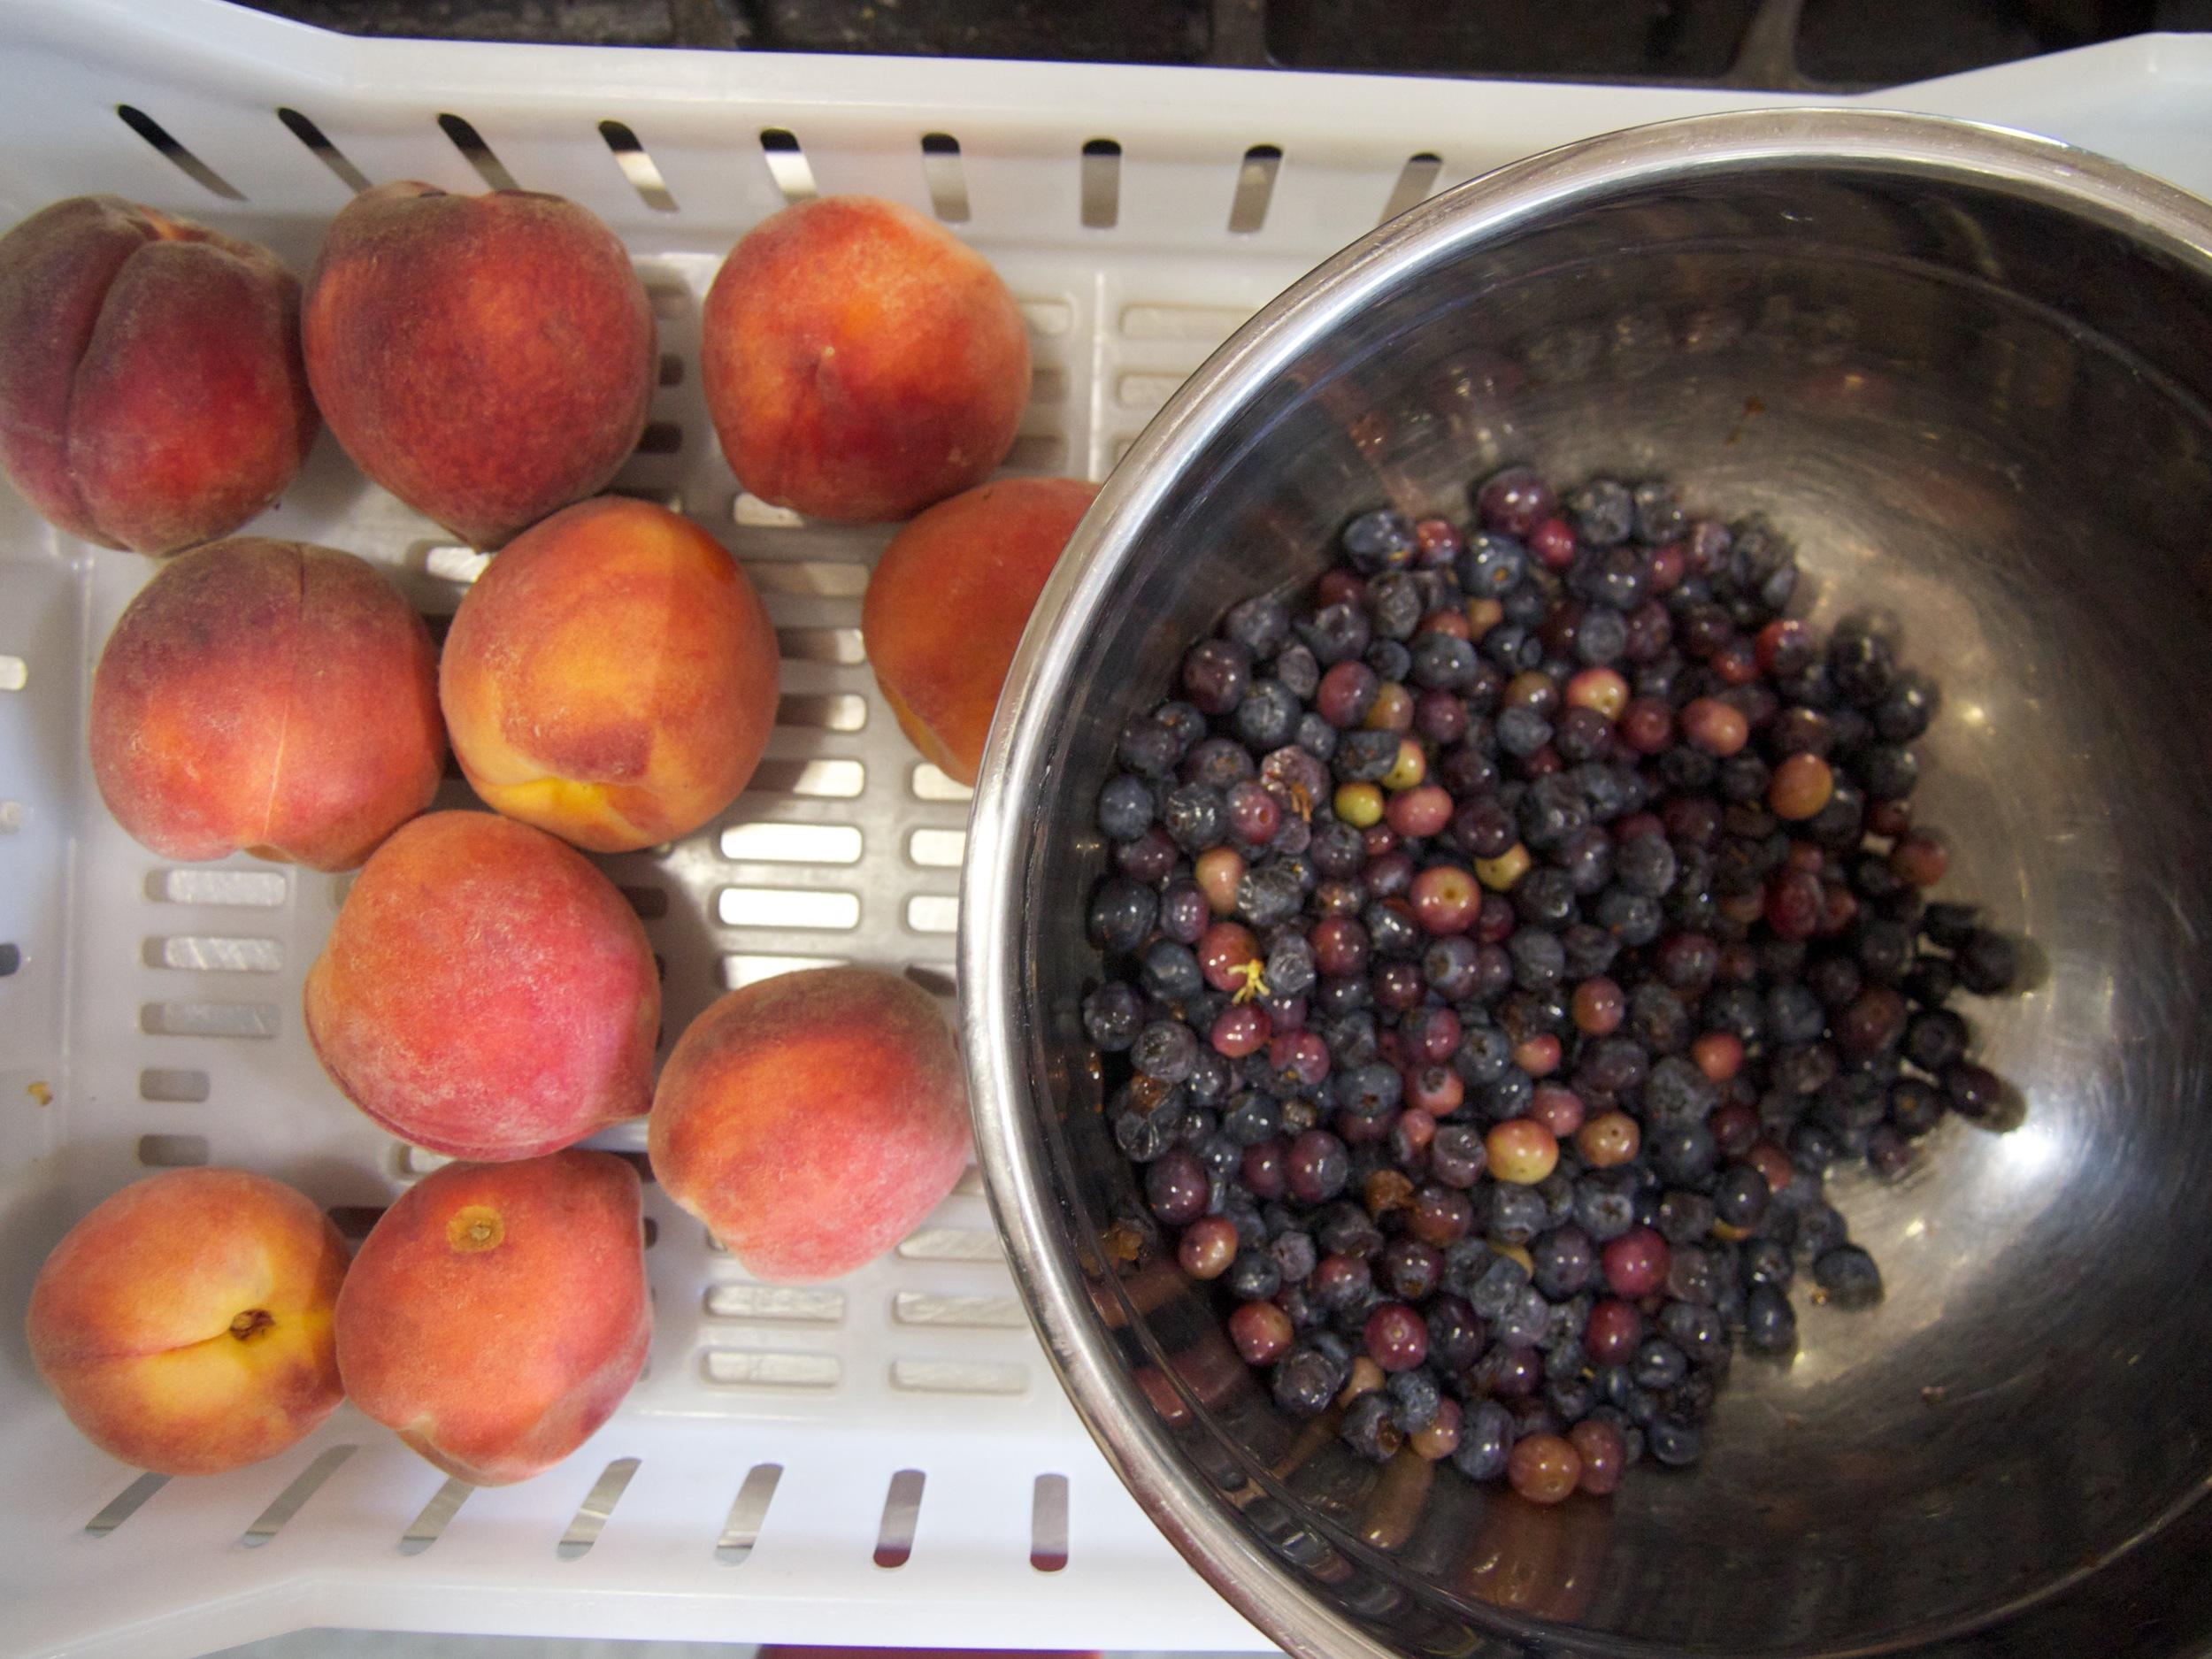 S2D1 2015 peaches & blueberries.jpg